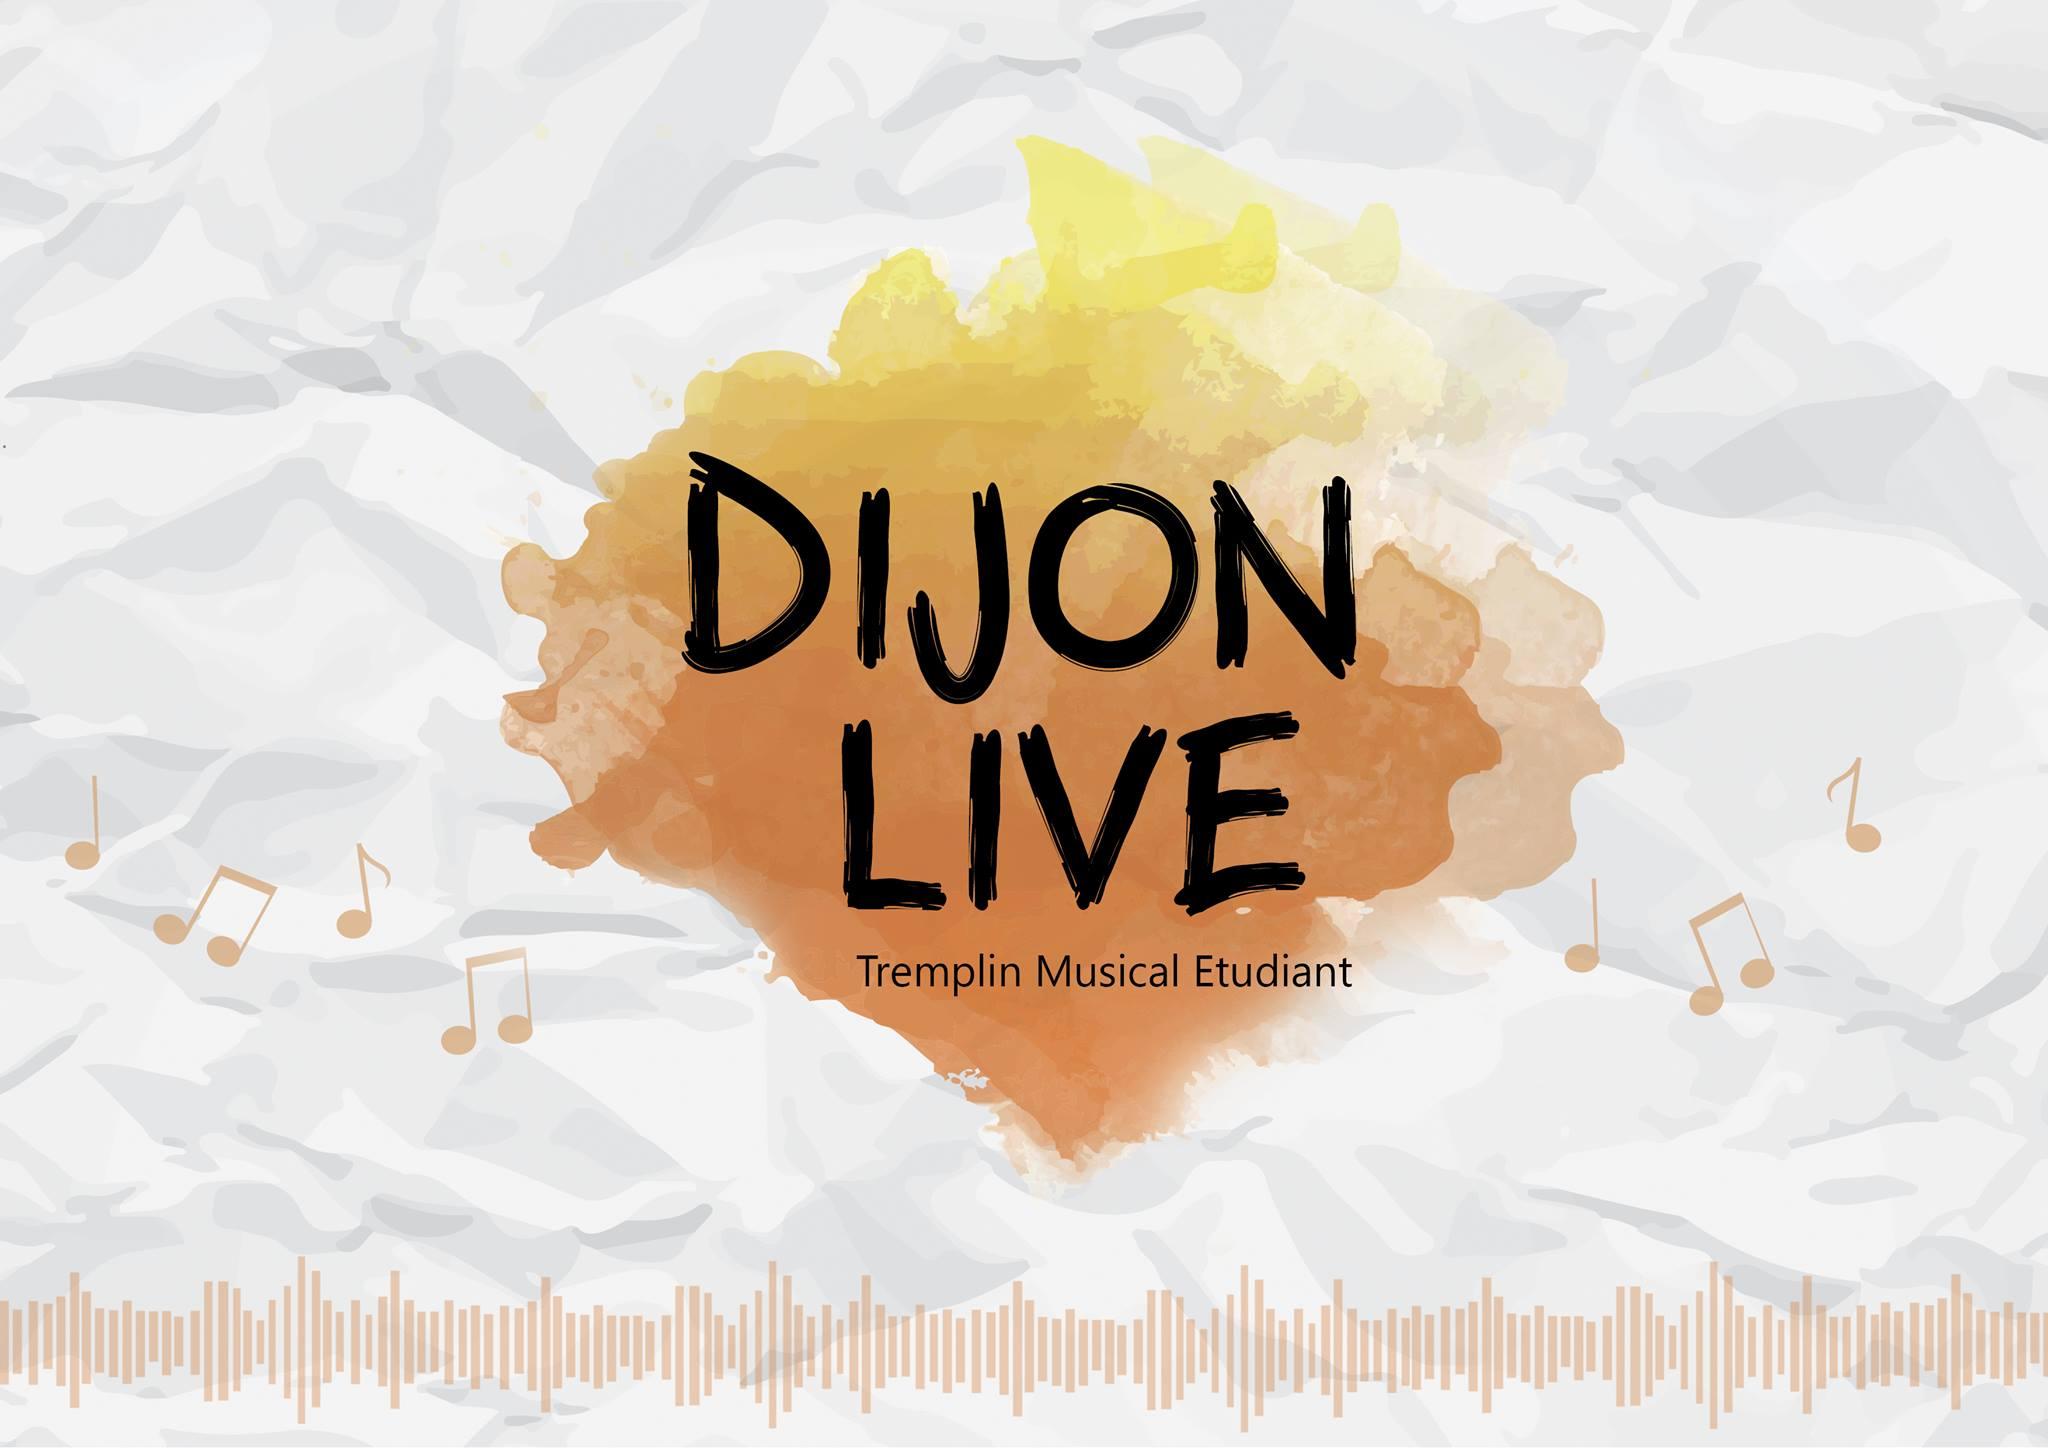 Dijon Live